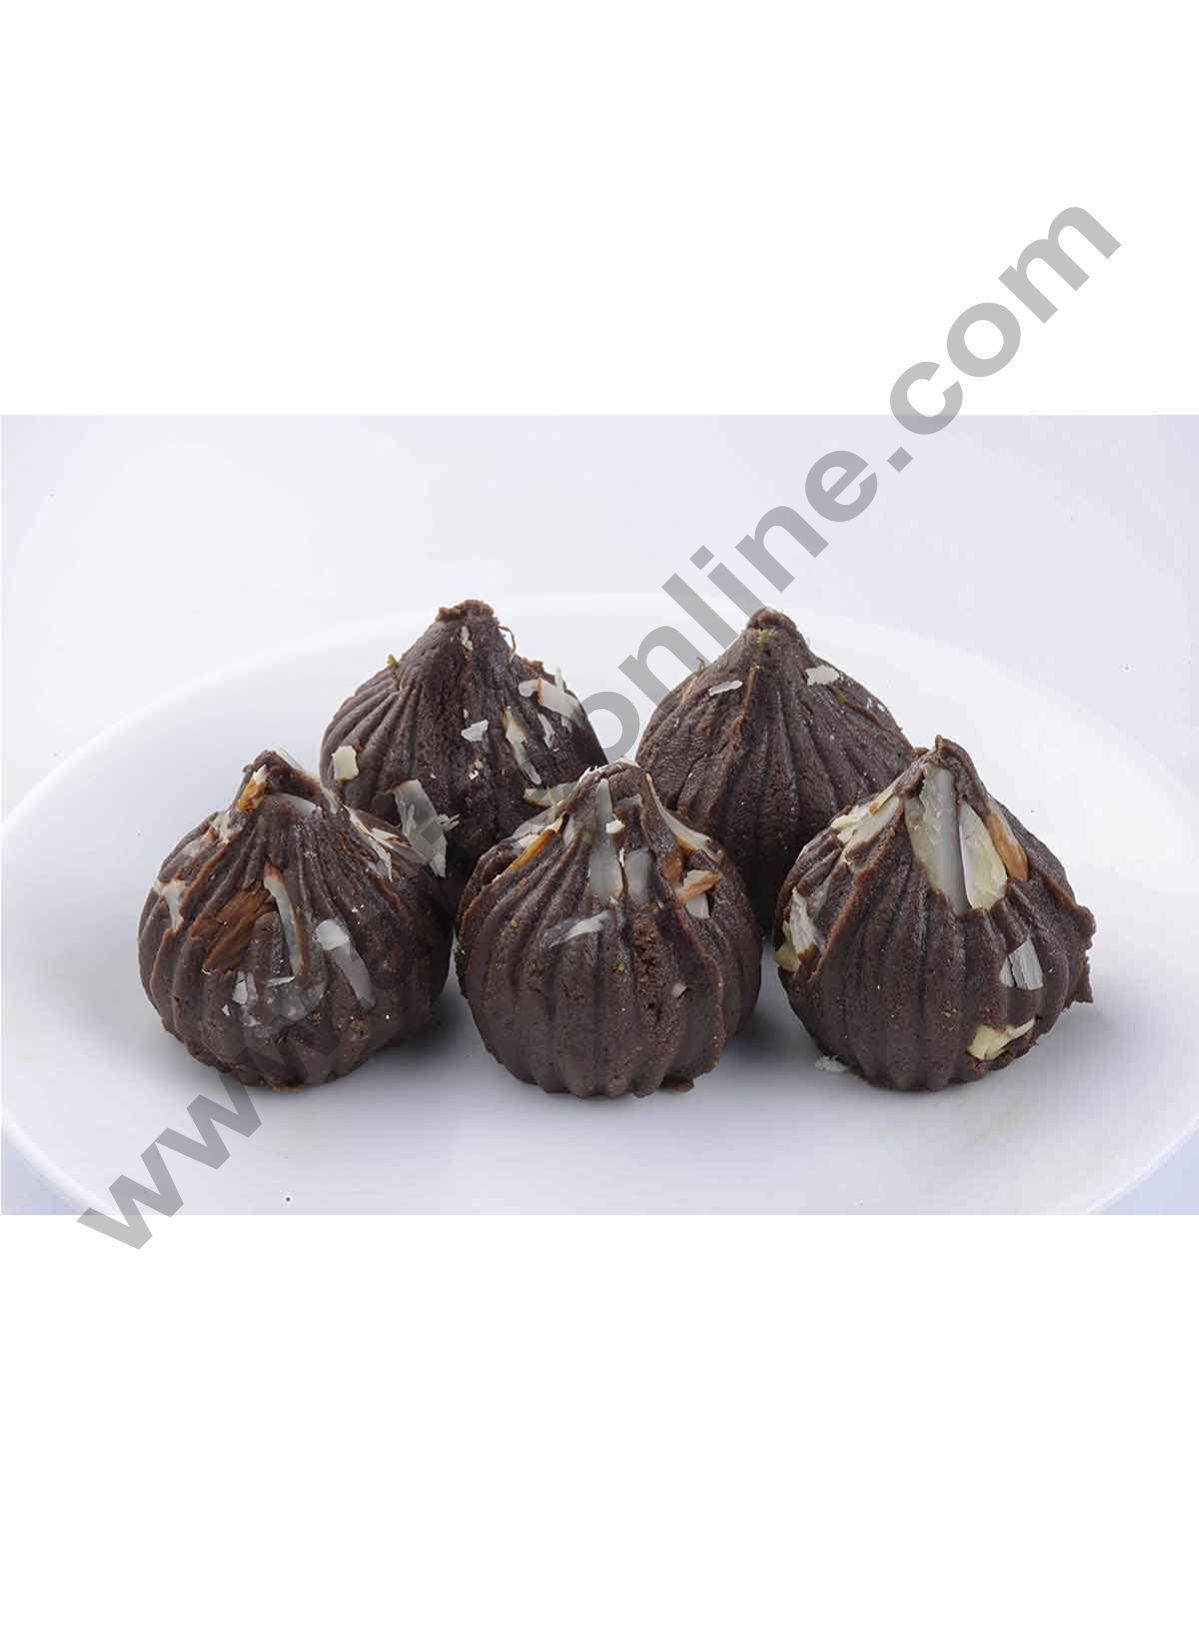 Cake Decor New Modak Shape 8 Cavity Chocolate Mould, Silicone Molds for Chocolate, Chocolate Silicone Moulds, Silicon Brown Chocolate Moulds for Ganesh Chaturti Festivals